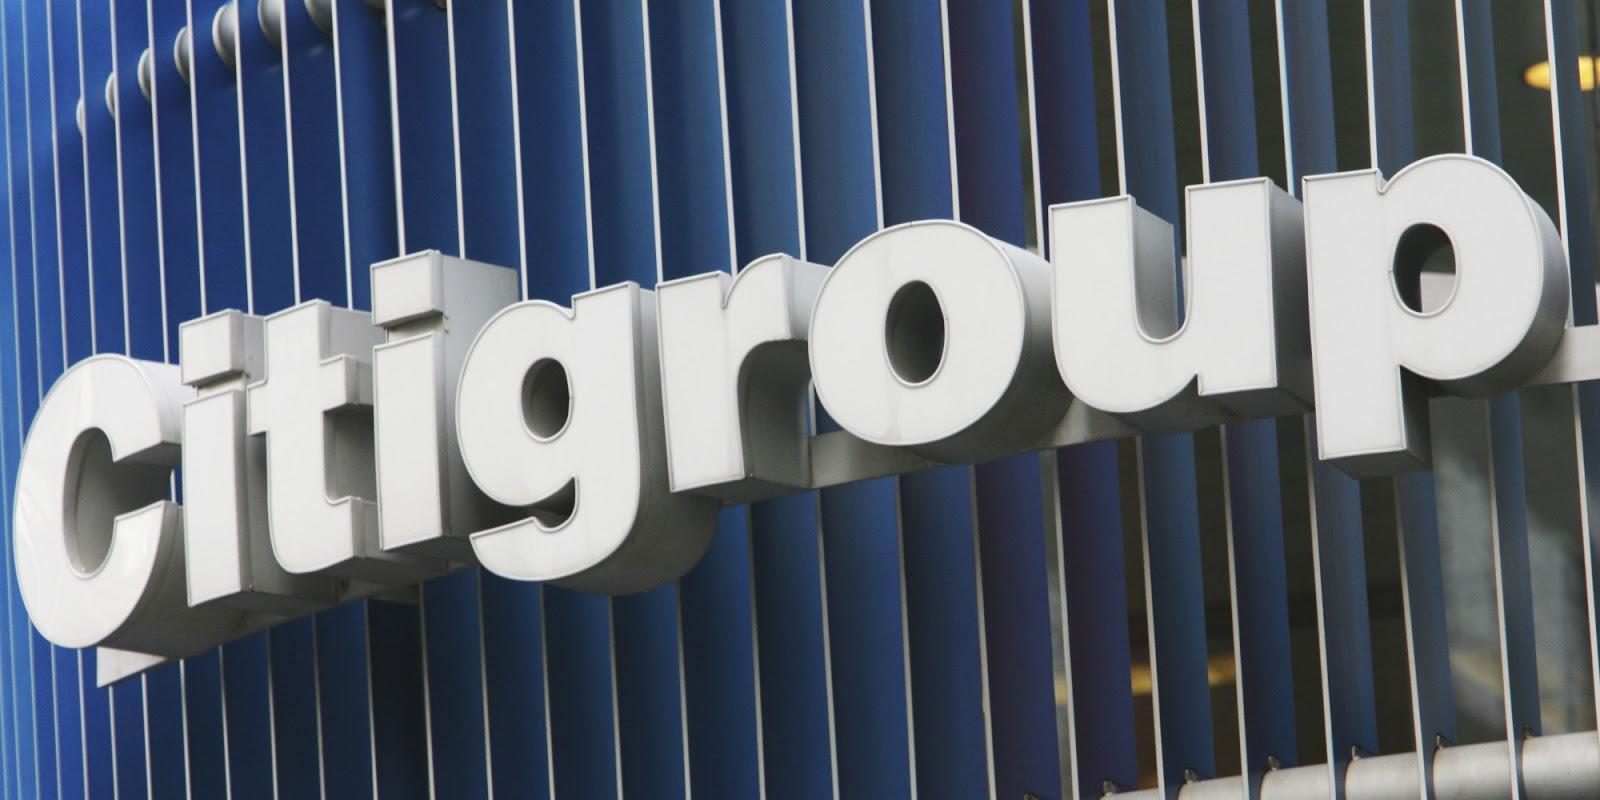 Citigroup Inc